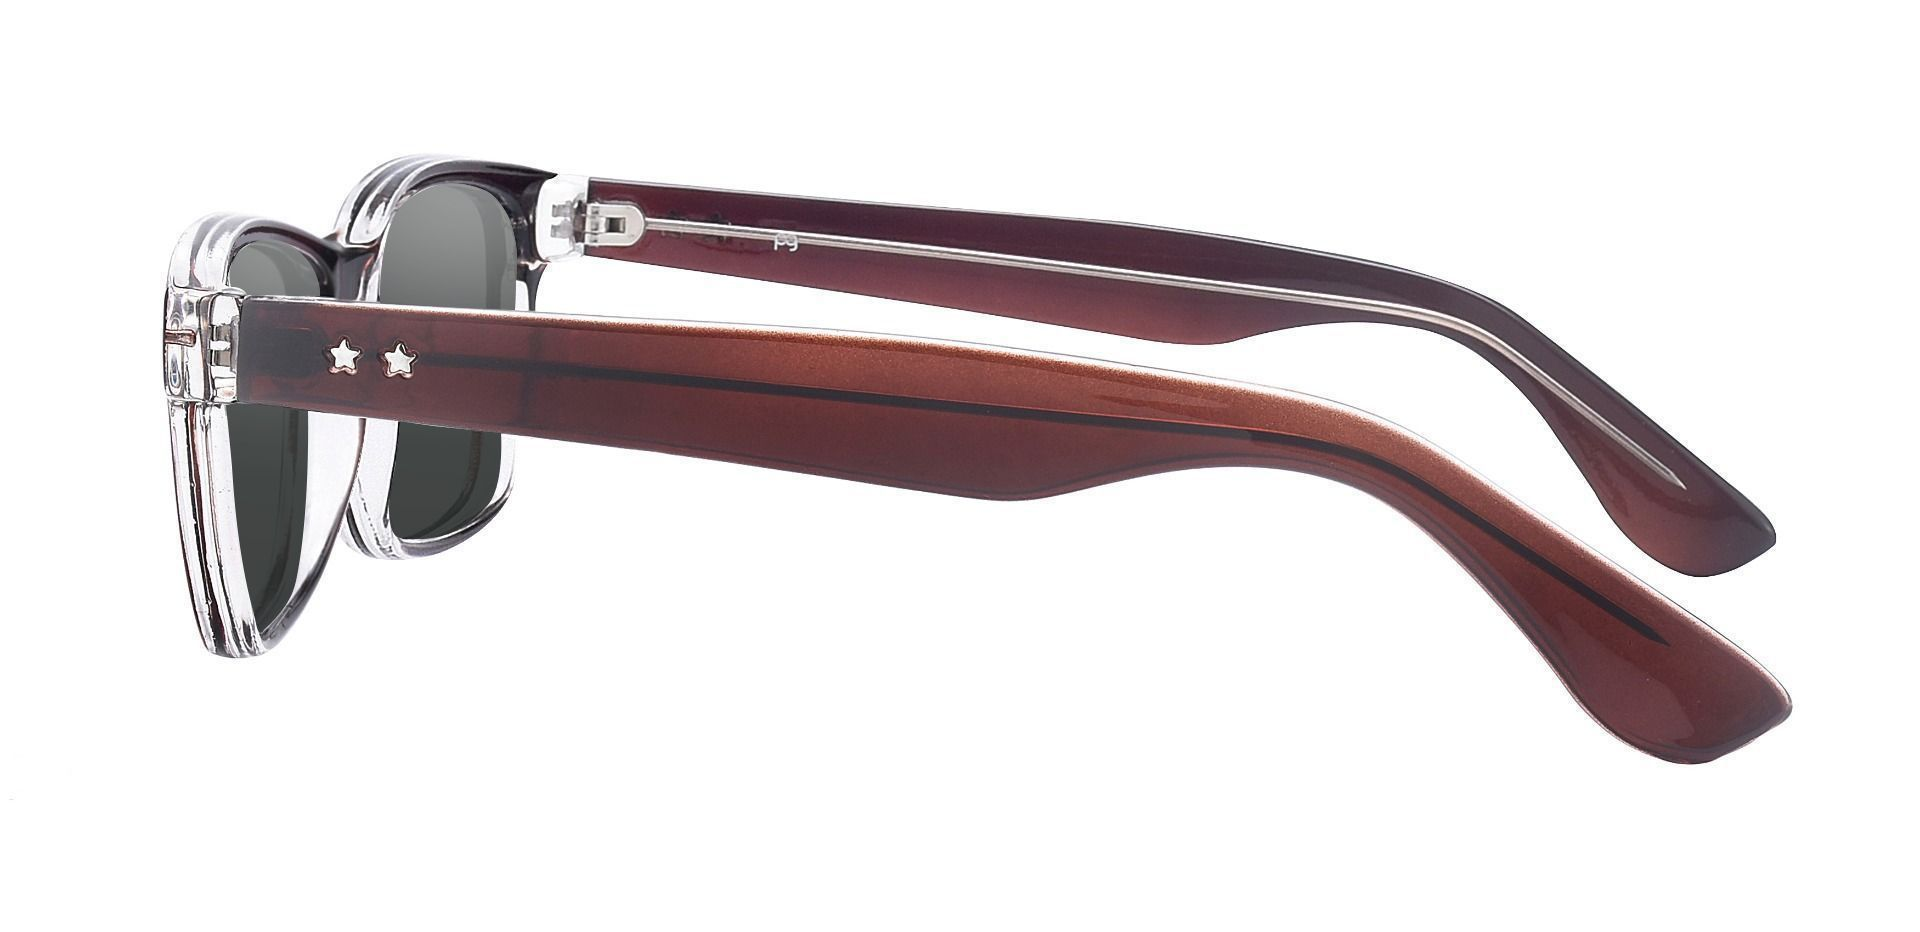 Cochran Rectangle Prescription Sunglasses - Brown Frame With Gray Lenses